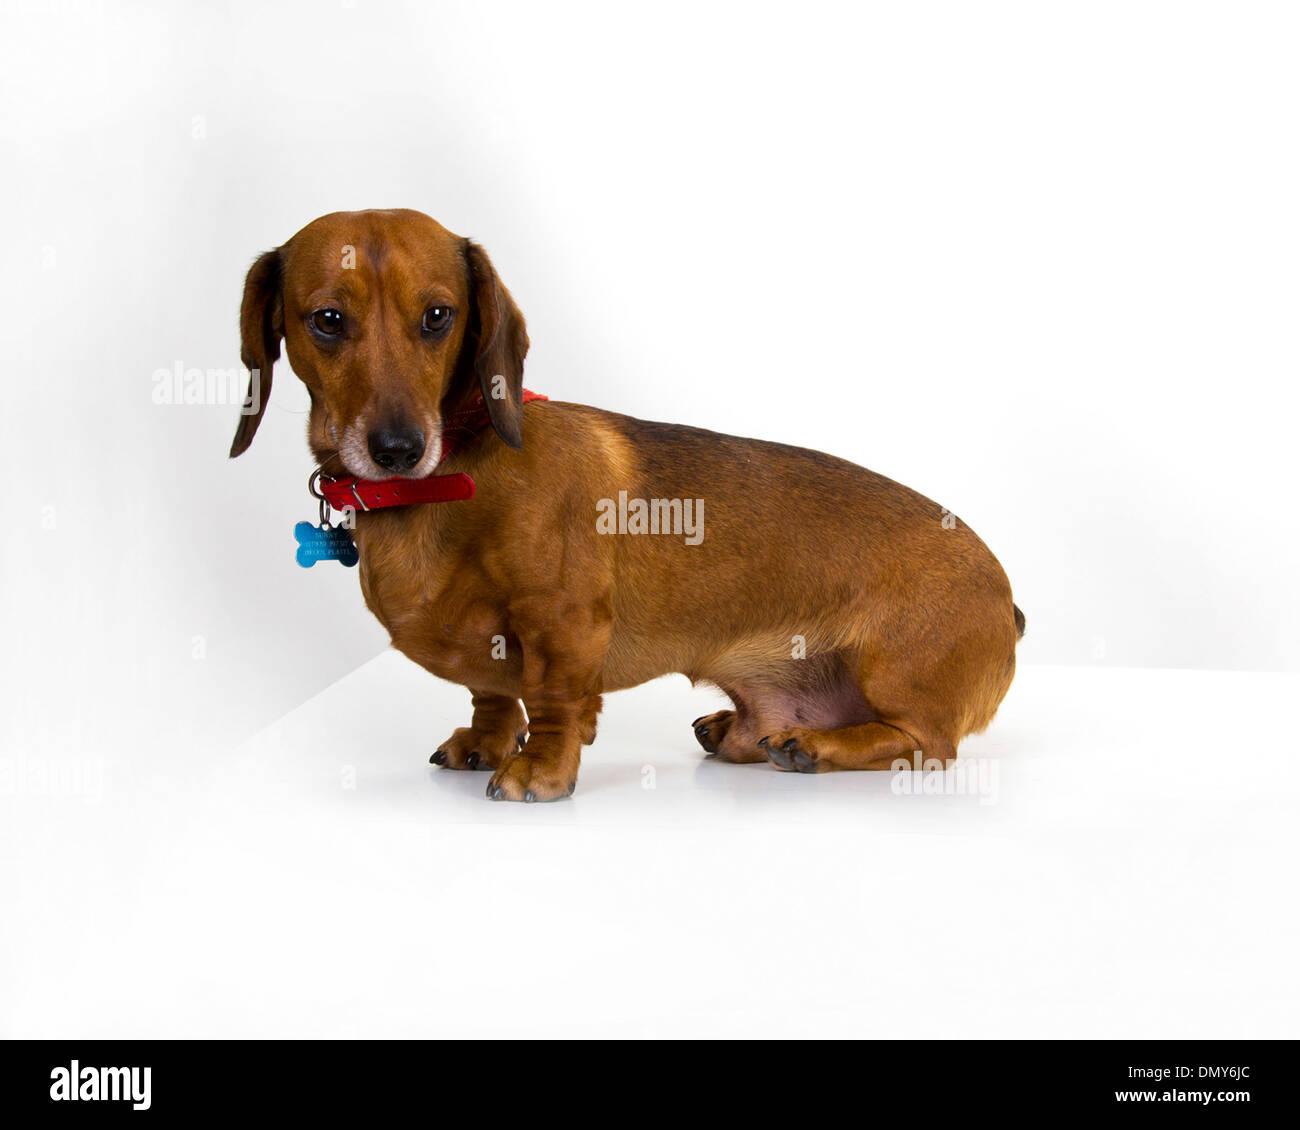 Is a dachshund a pedigree